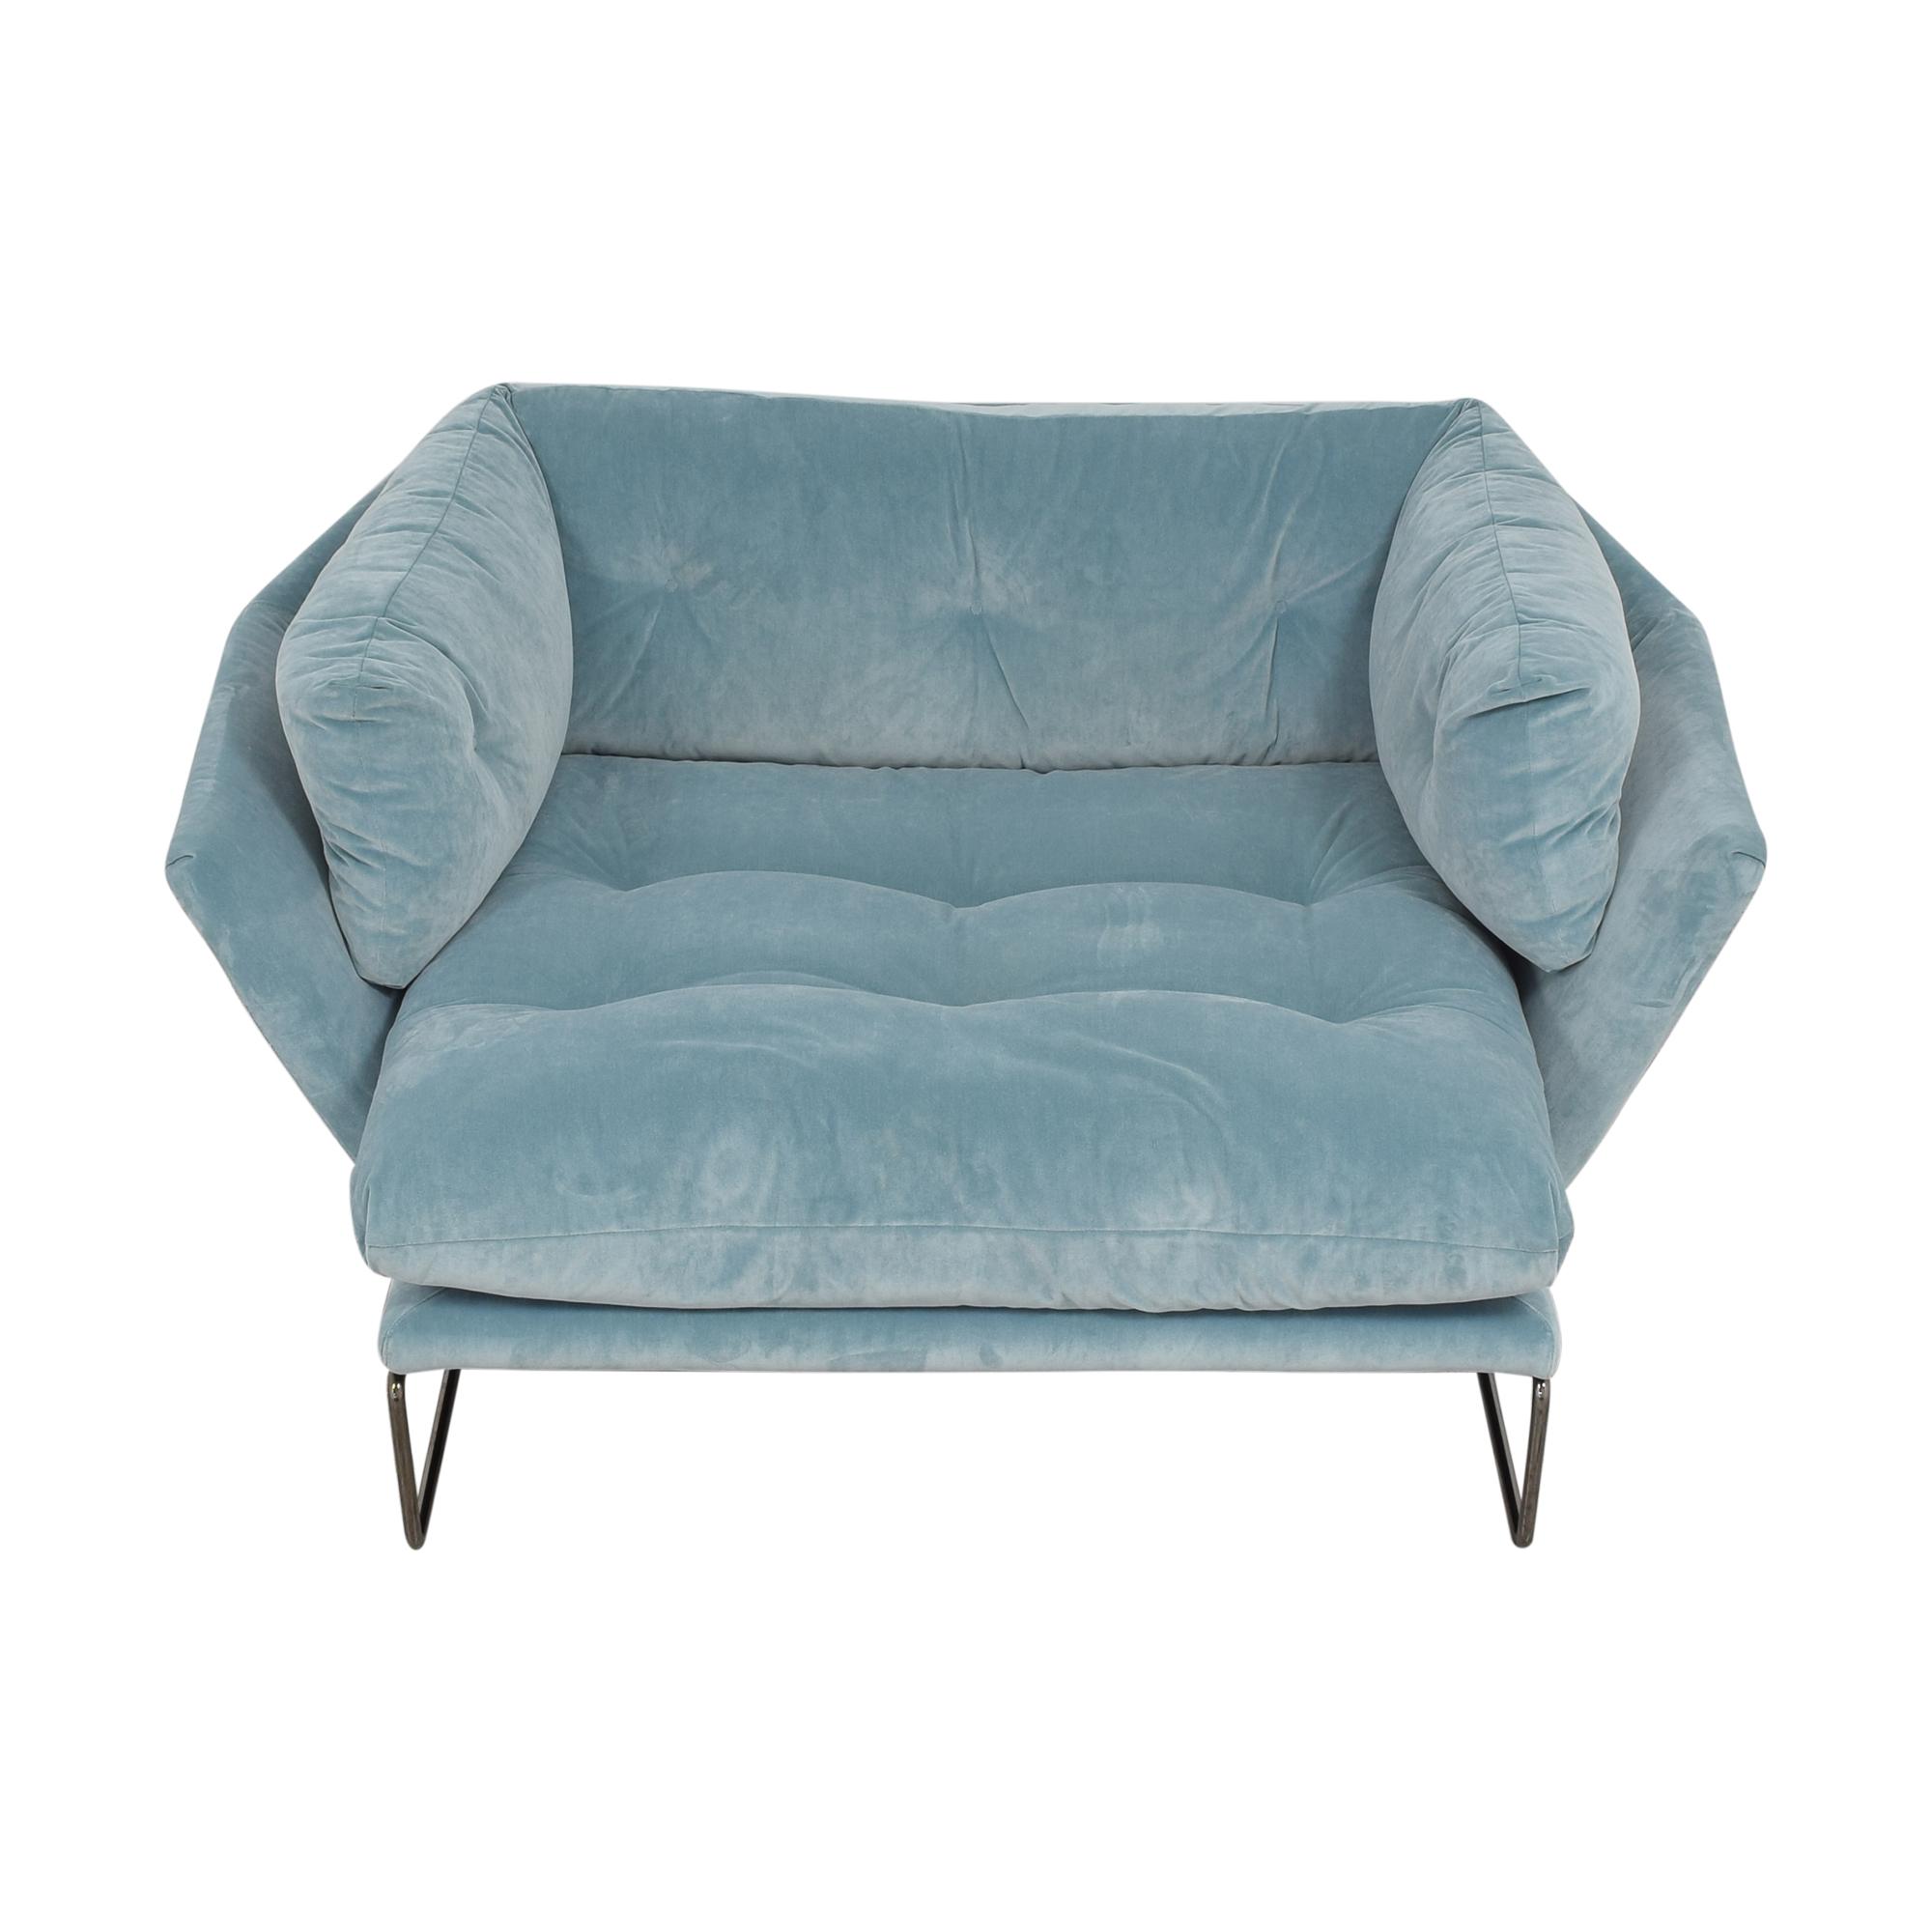 buy ABC Carpet & Home ABC Carpet & Home New York Suite Double Chair online